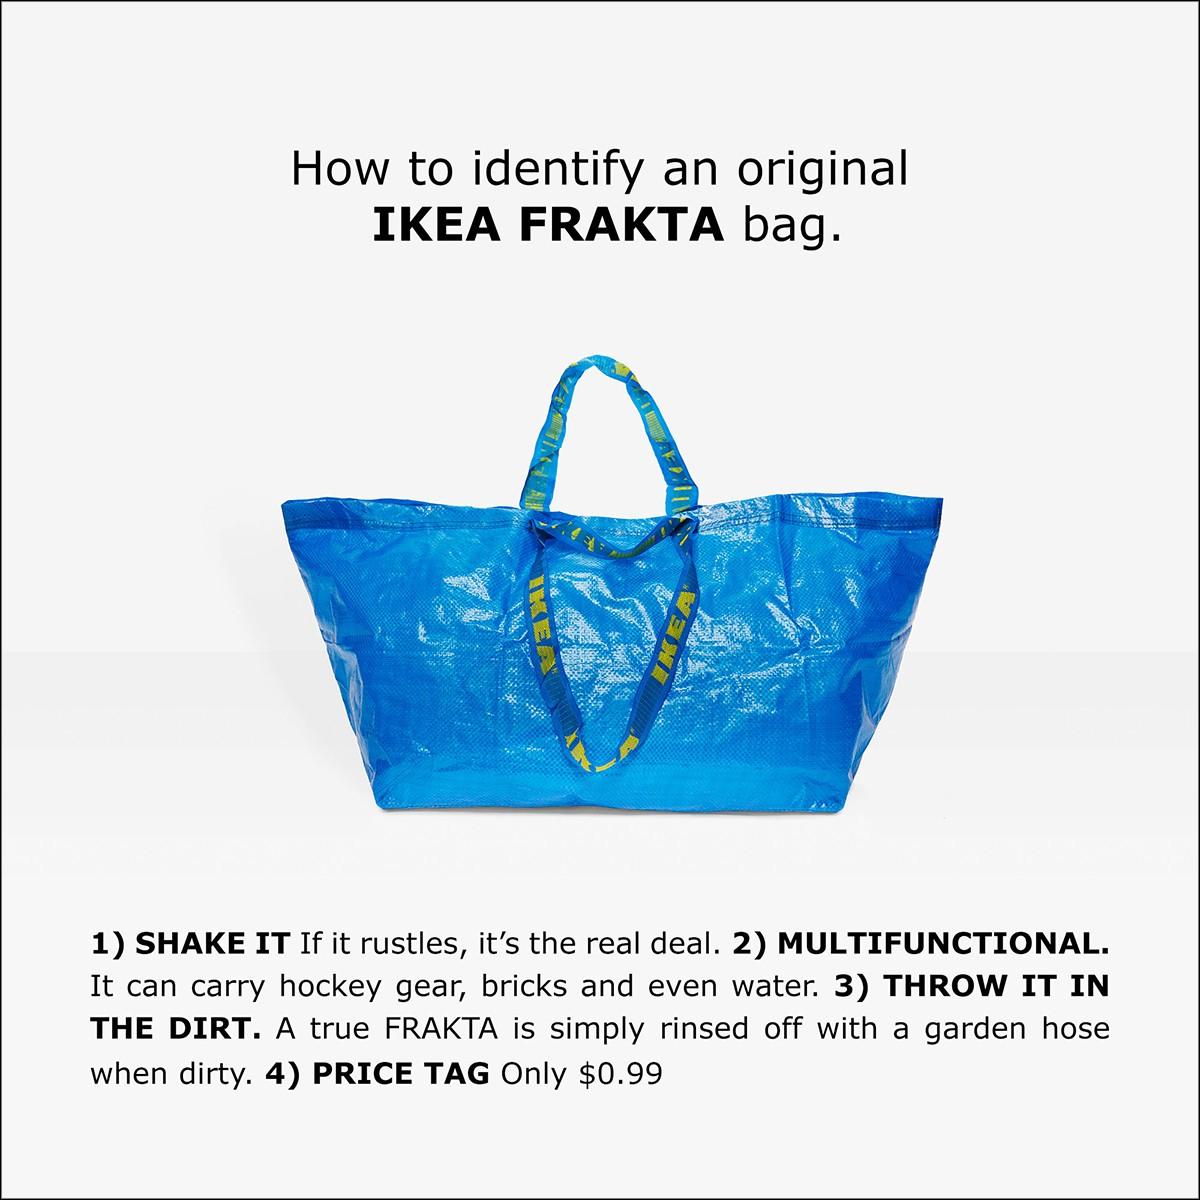 ikea-responds-balenciaga-copycat-tote-bag-02-1200x1200.jpg